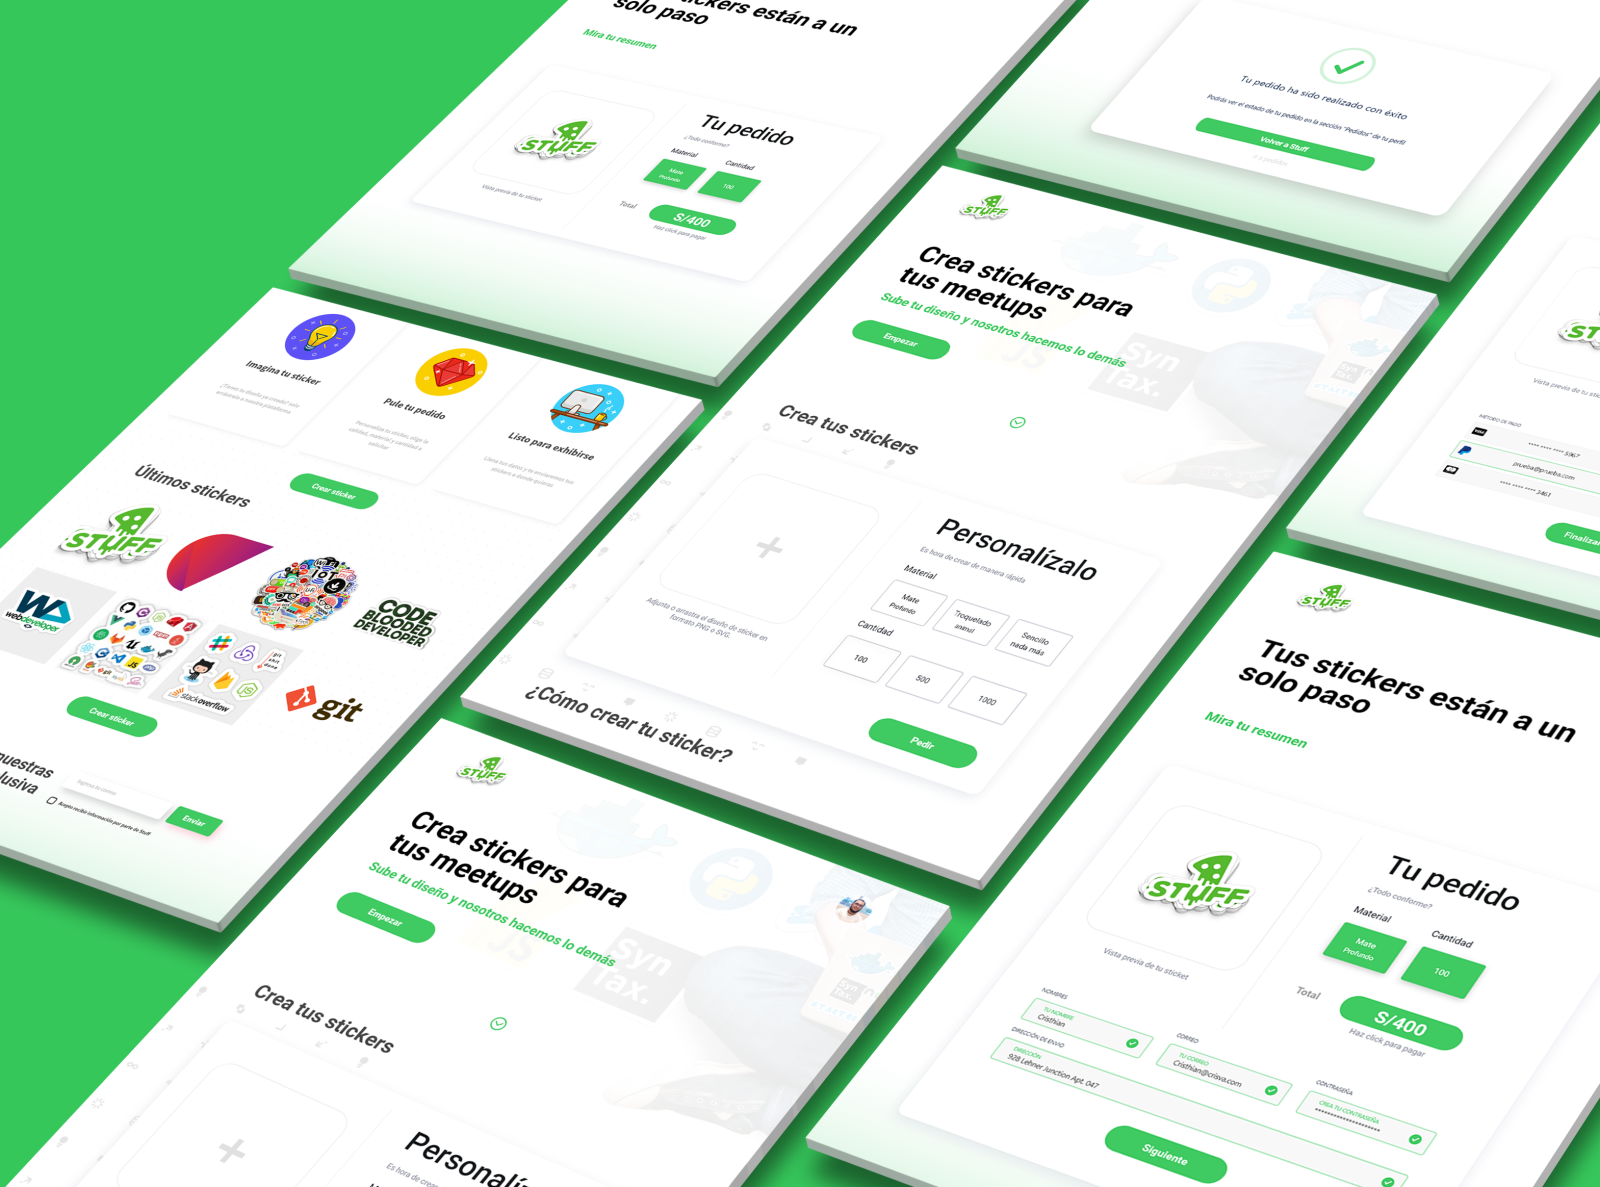 Custom stickers platform concept stuff by cristhian valle